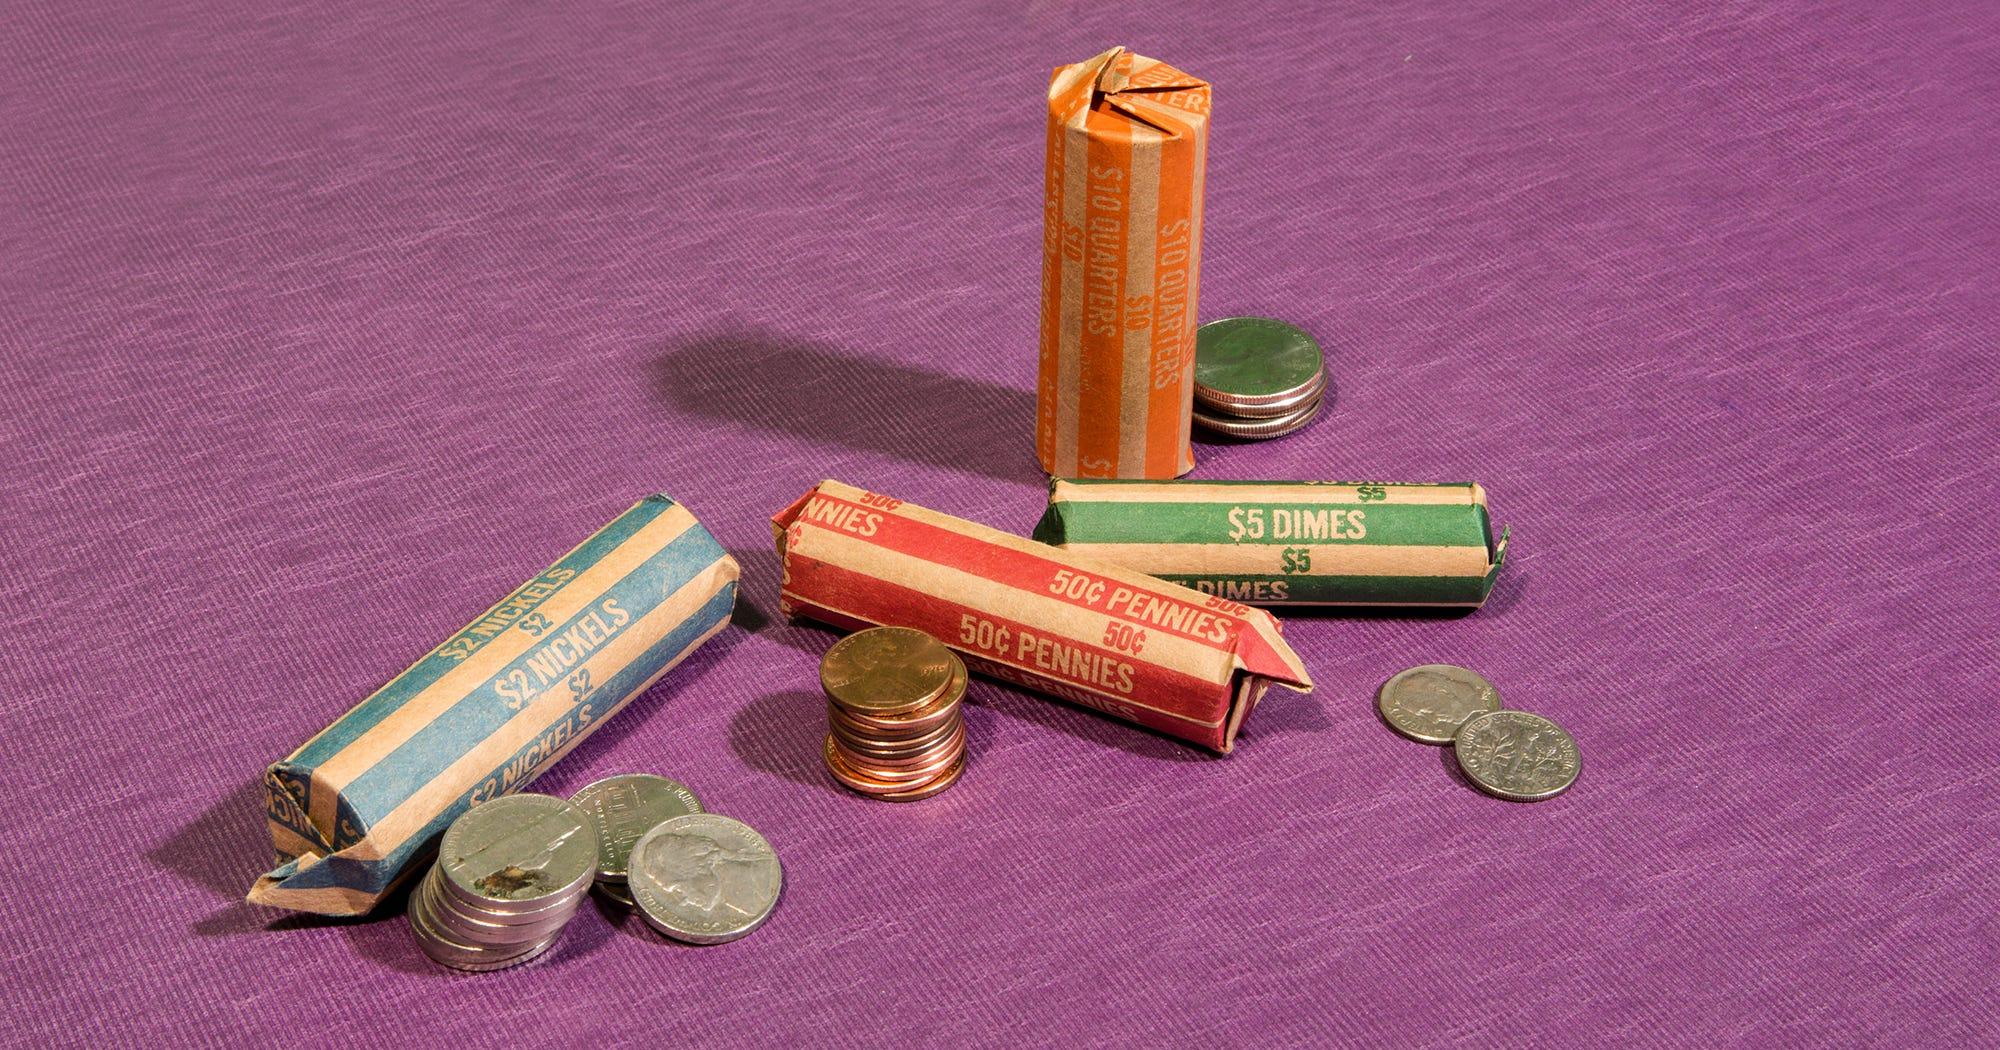 Td bank coin machine / Supernet santander token banking login